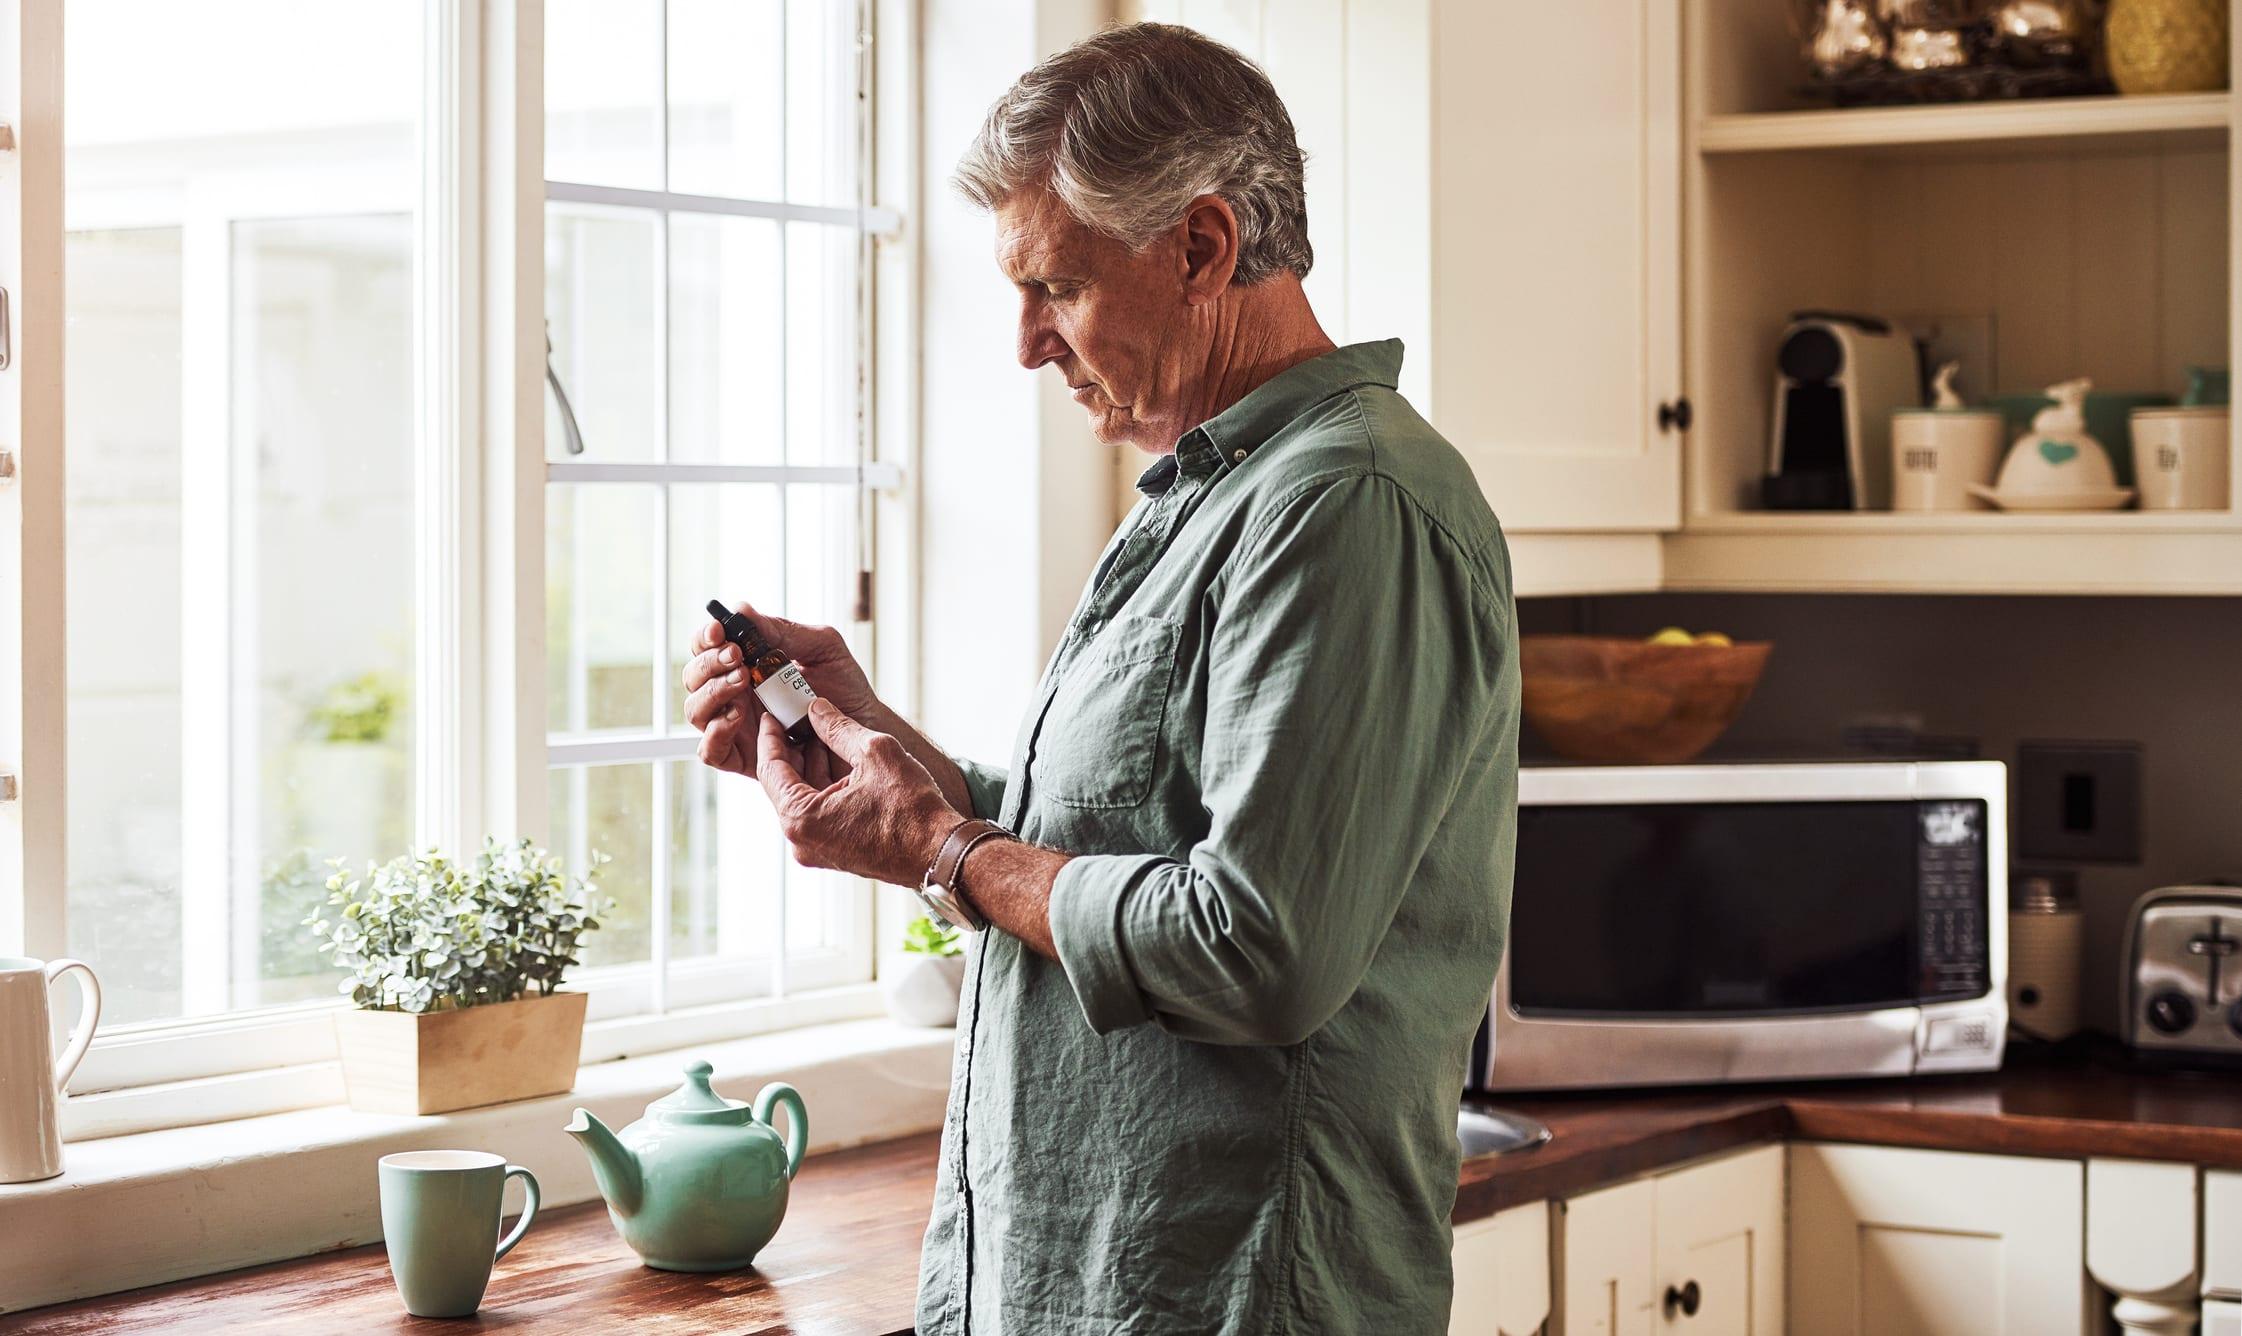 Man Preparing a Cup of Tea with CBD Oil